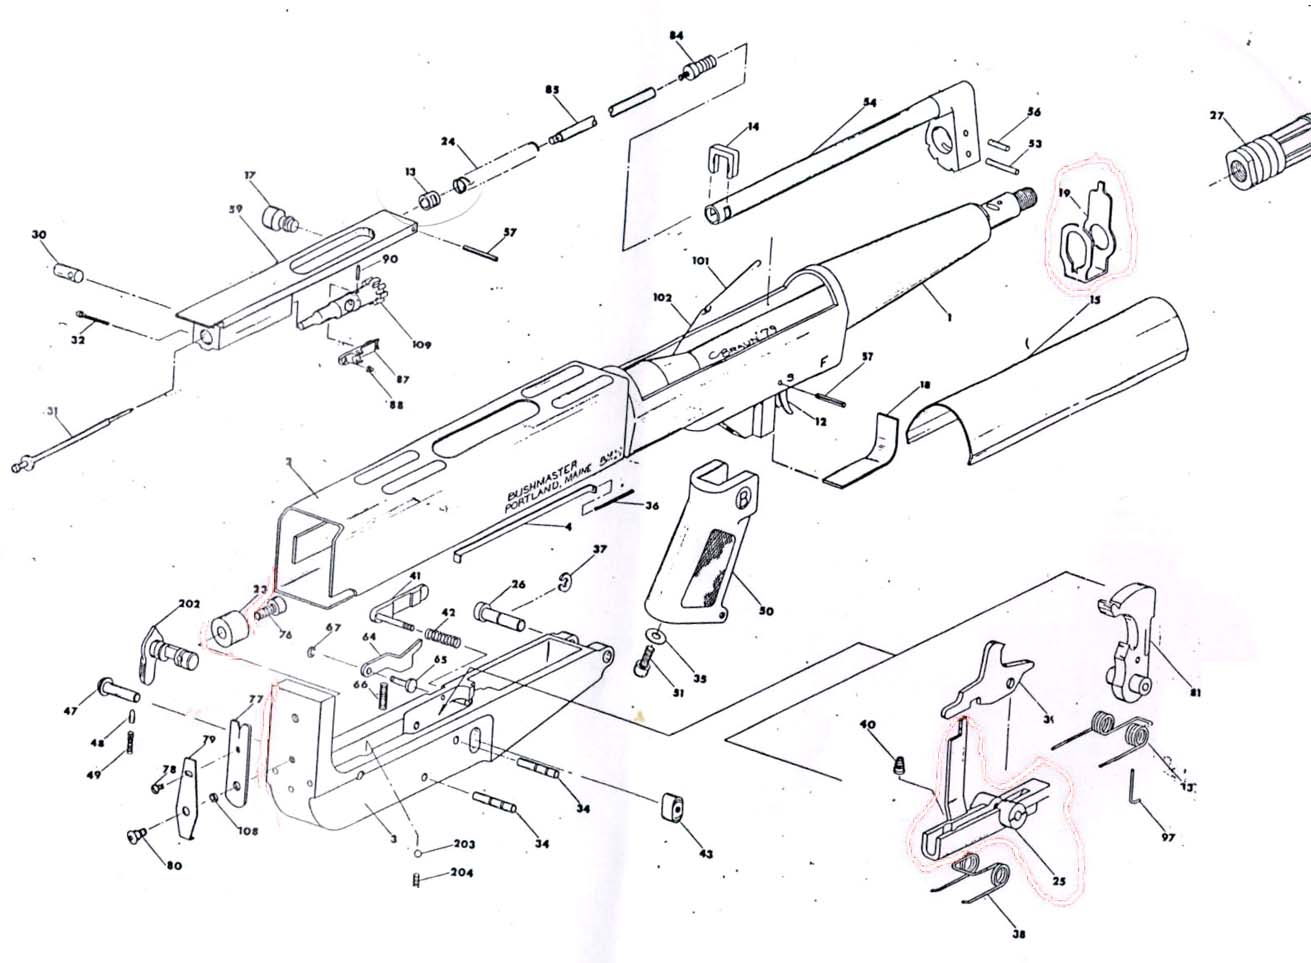 m16 exploded diagram waterway executive spa pump wiring bushmaster armpistol